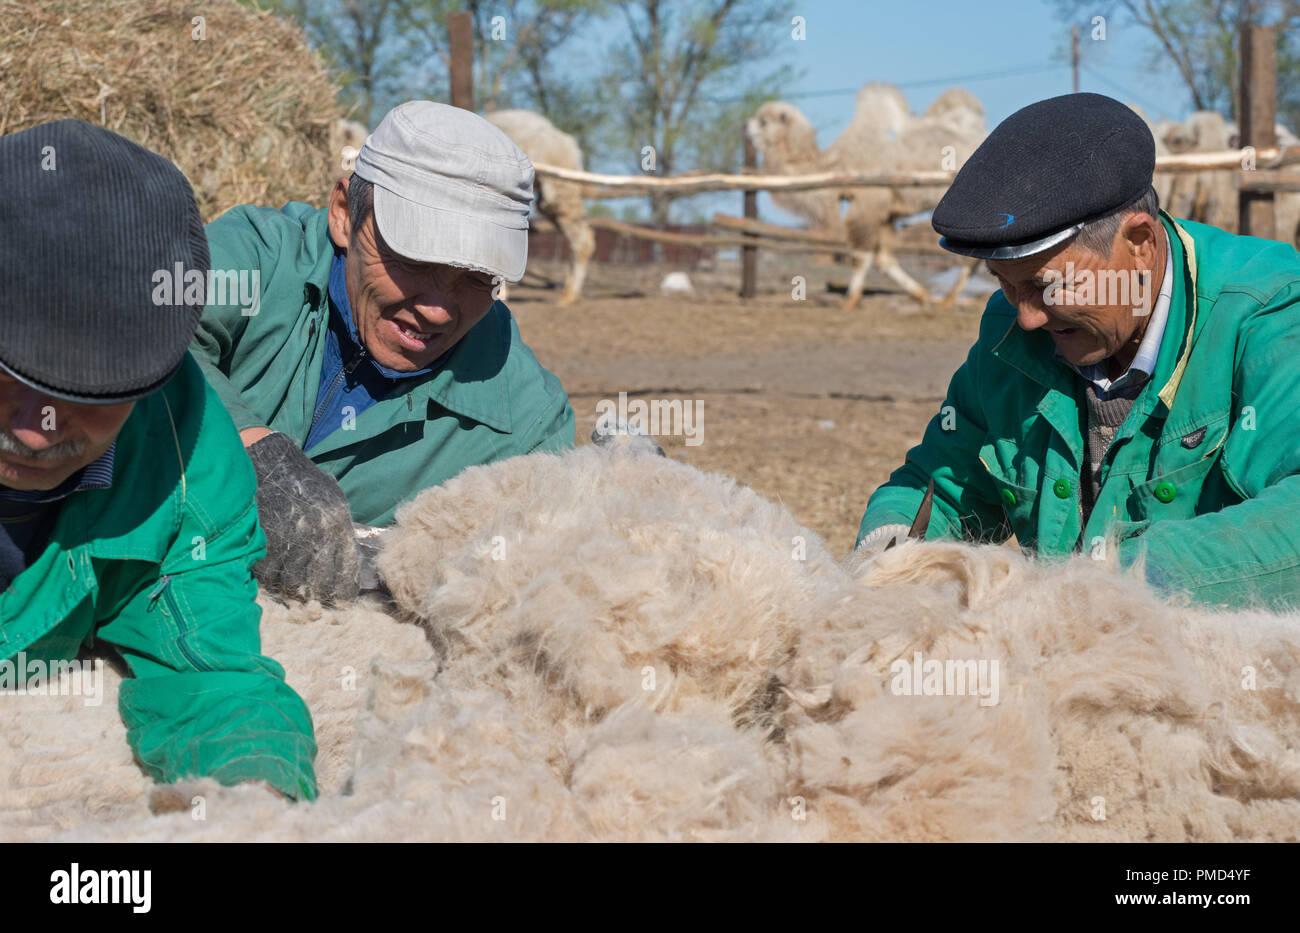 Bactrian camel shearing (clipping) at the camel farm «Aksarayskiy», Astrakhan region, Russia - Stock Image